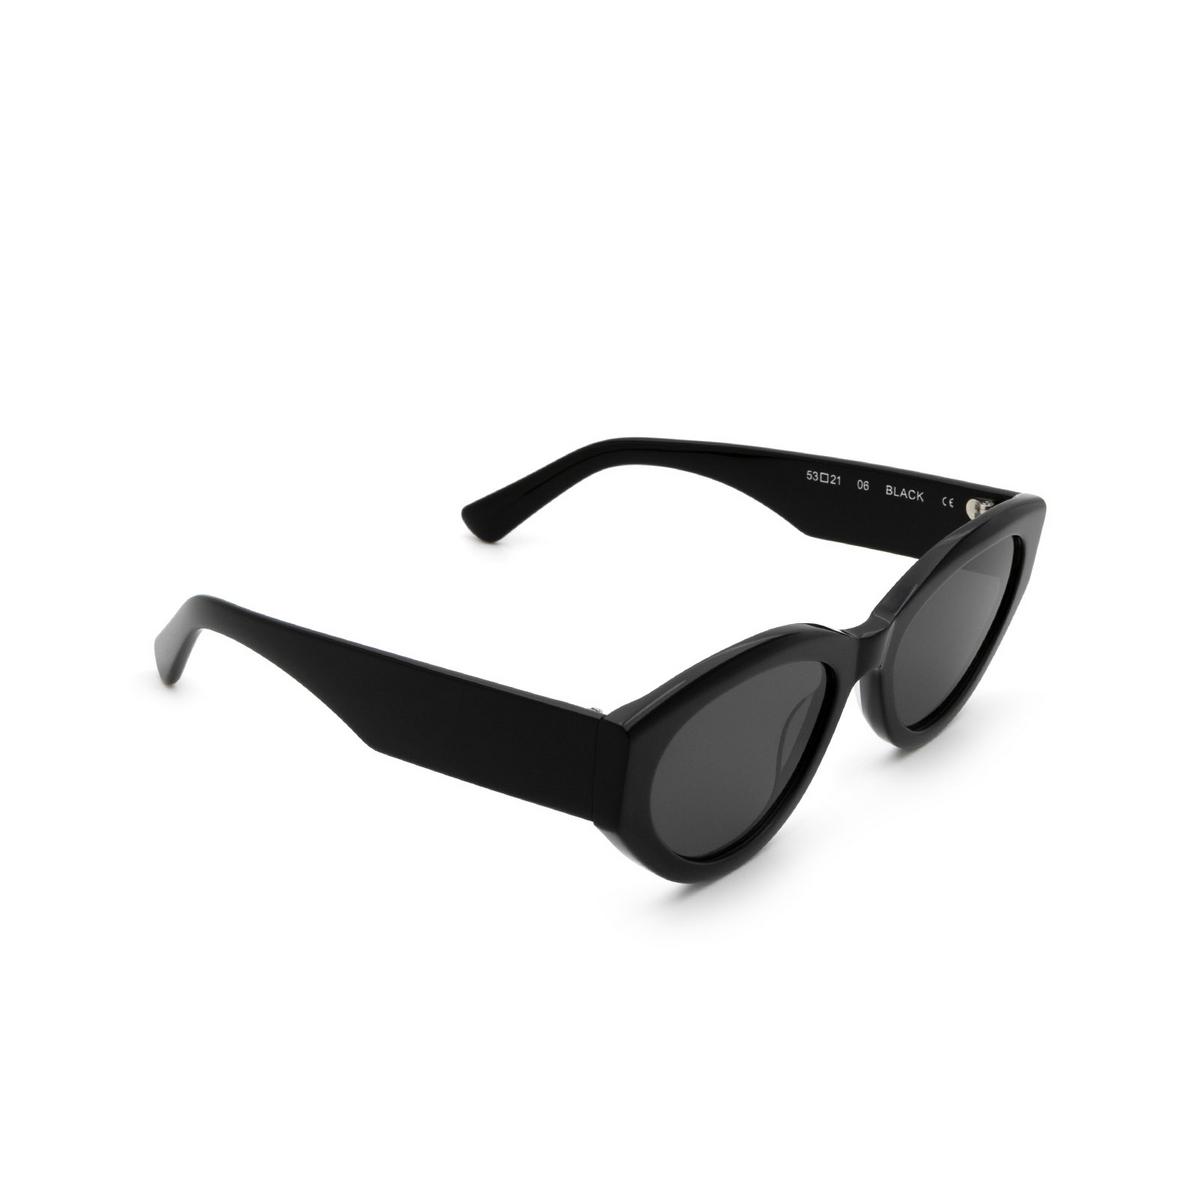 Chimi® Cat-eye Sunglasses: 06 color Black - three-quarters view.